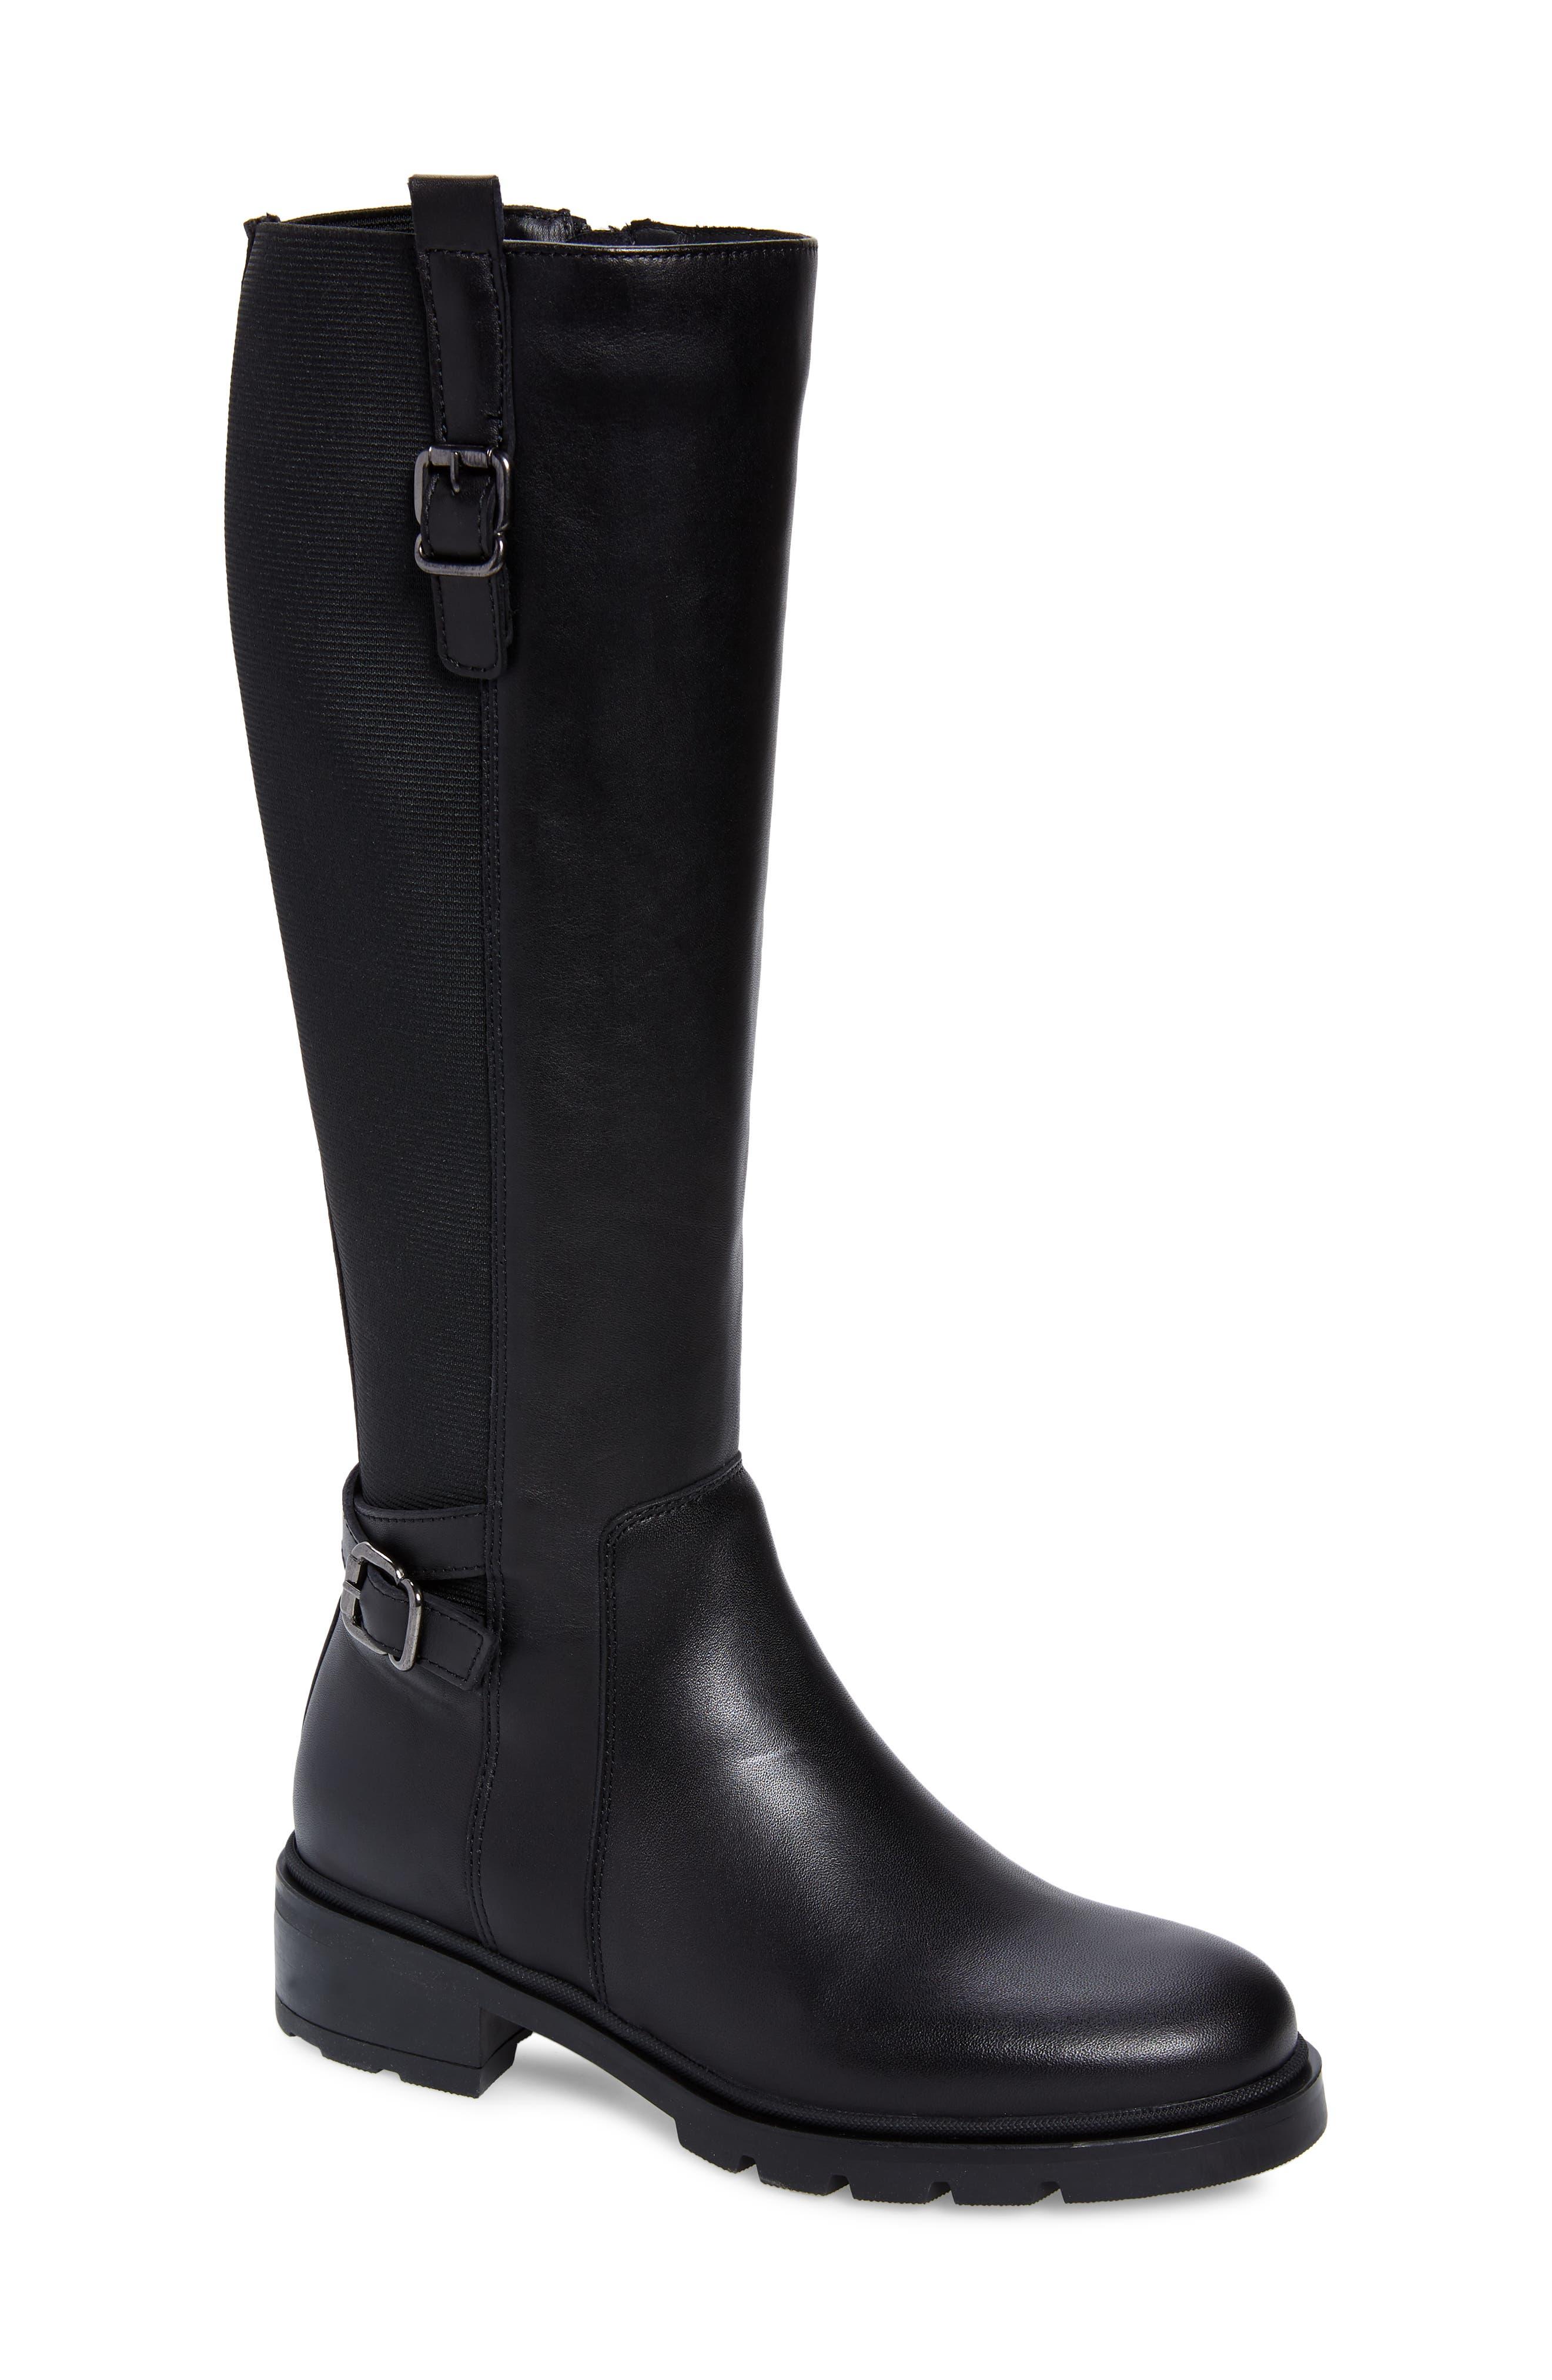 Saint Waterproof Lining Boot